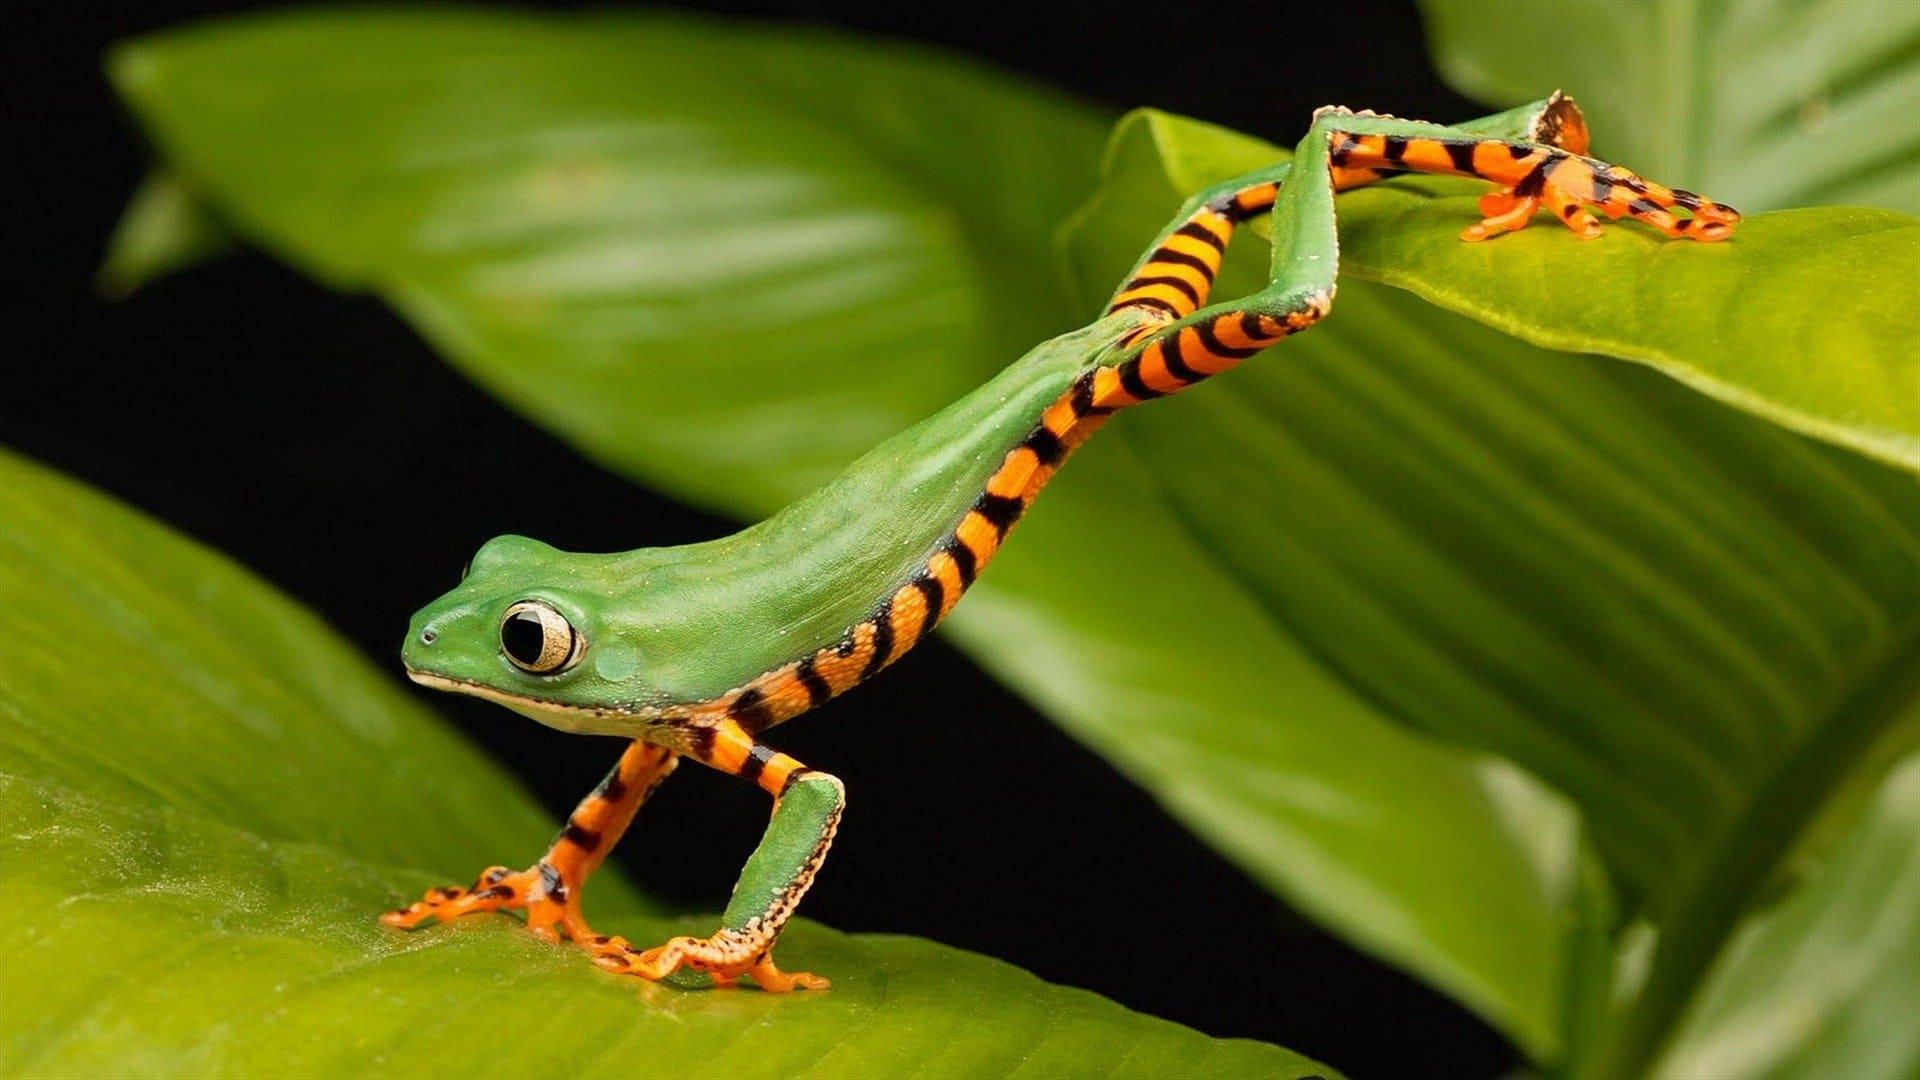 Rana saltando - Wiki Animales